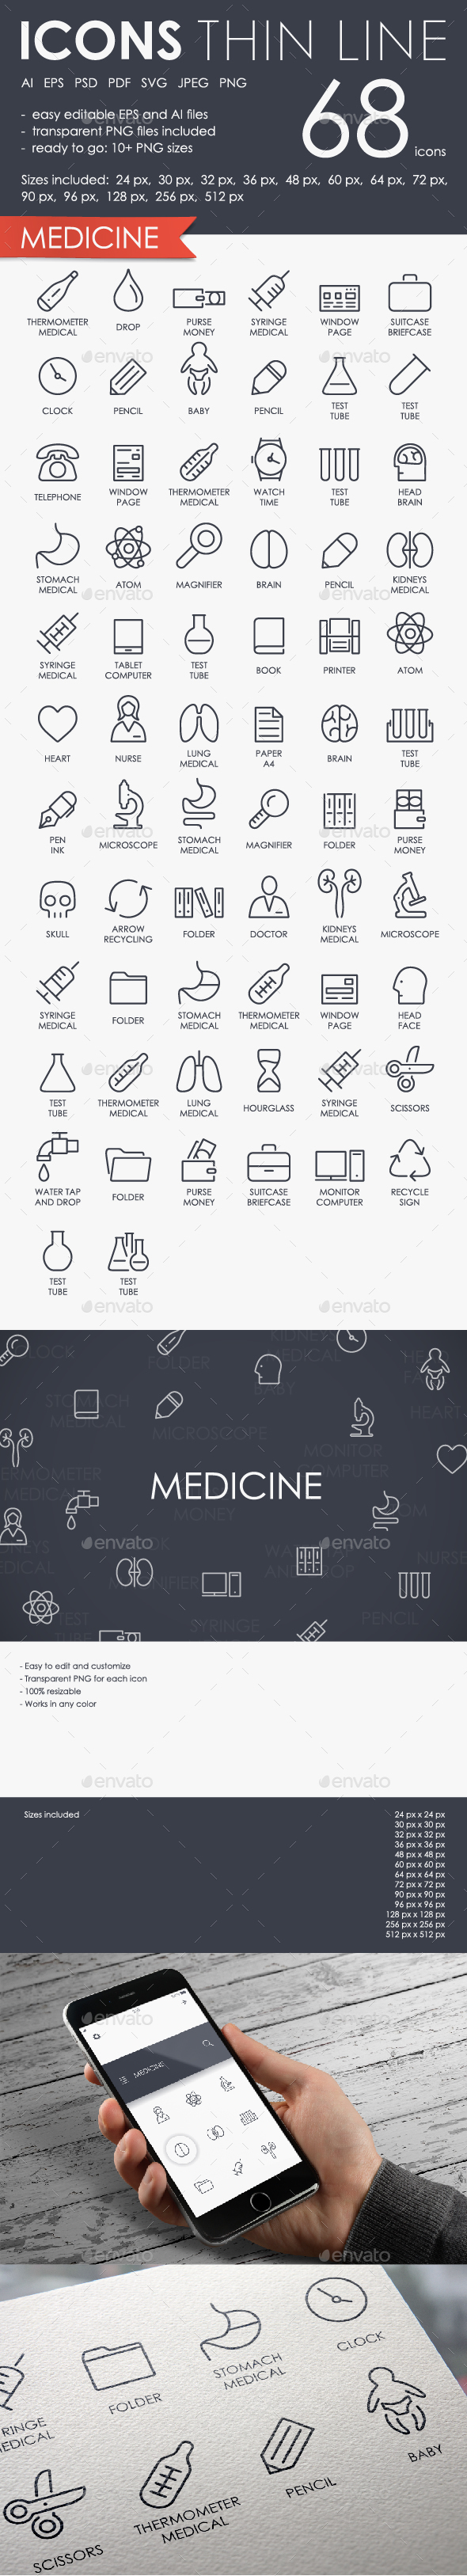 Medicine thinline icons - Icons